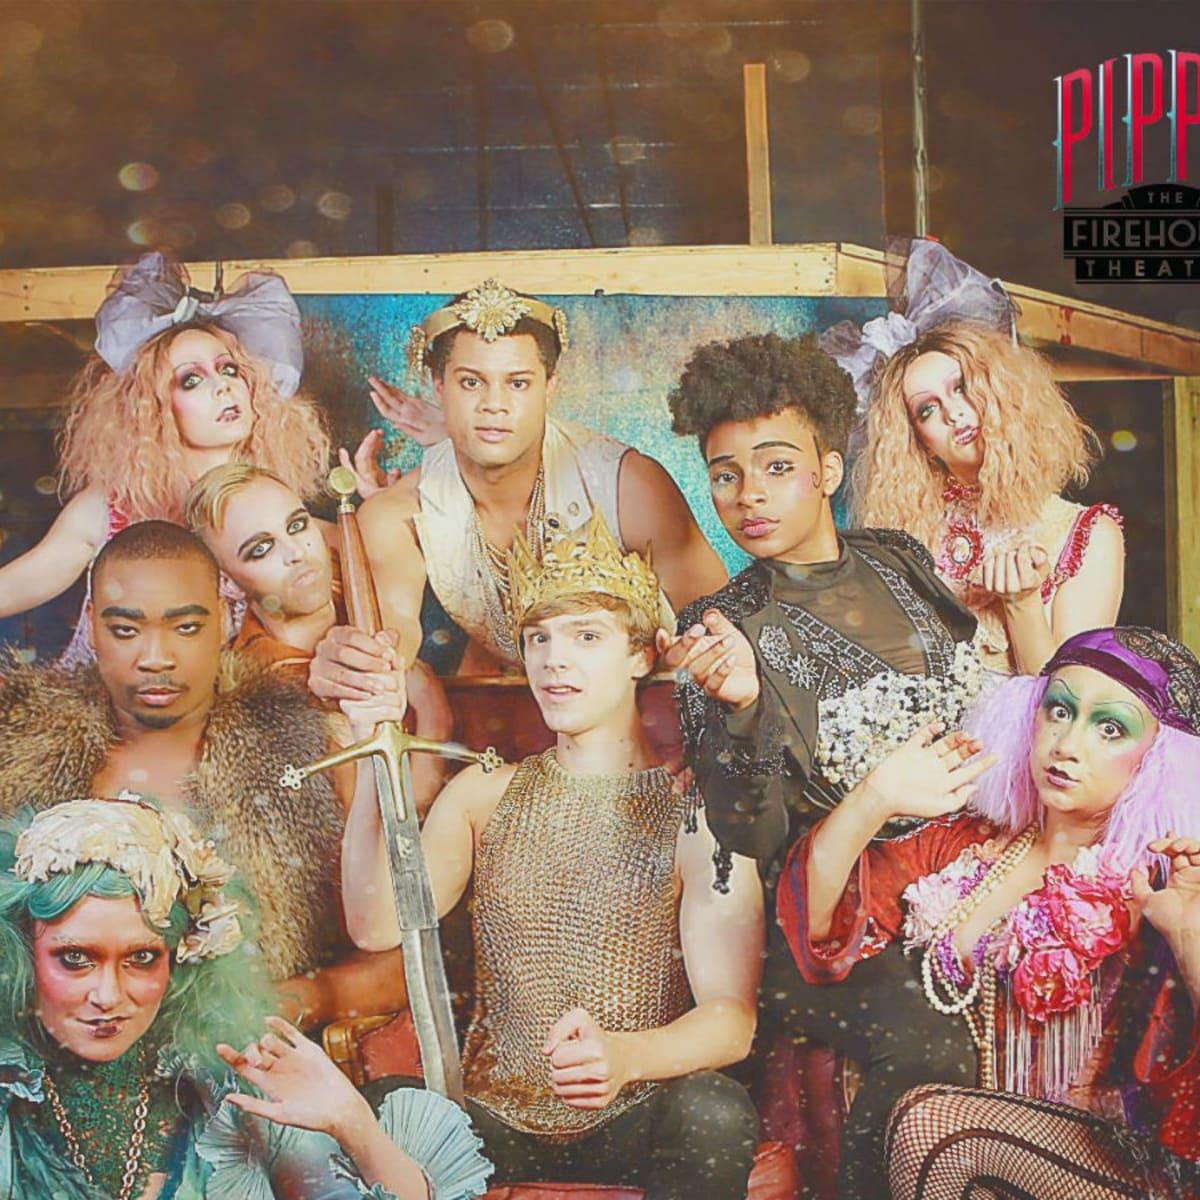 Firehouse Theatre presents Pippin